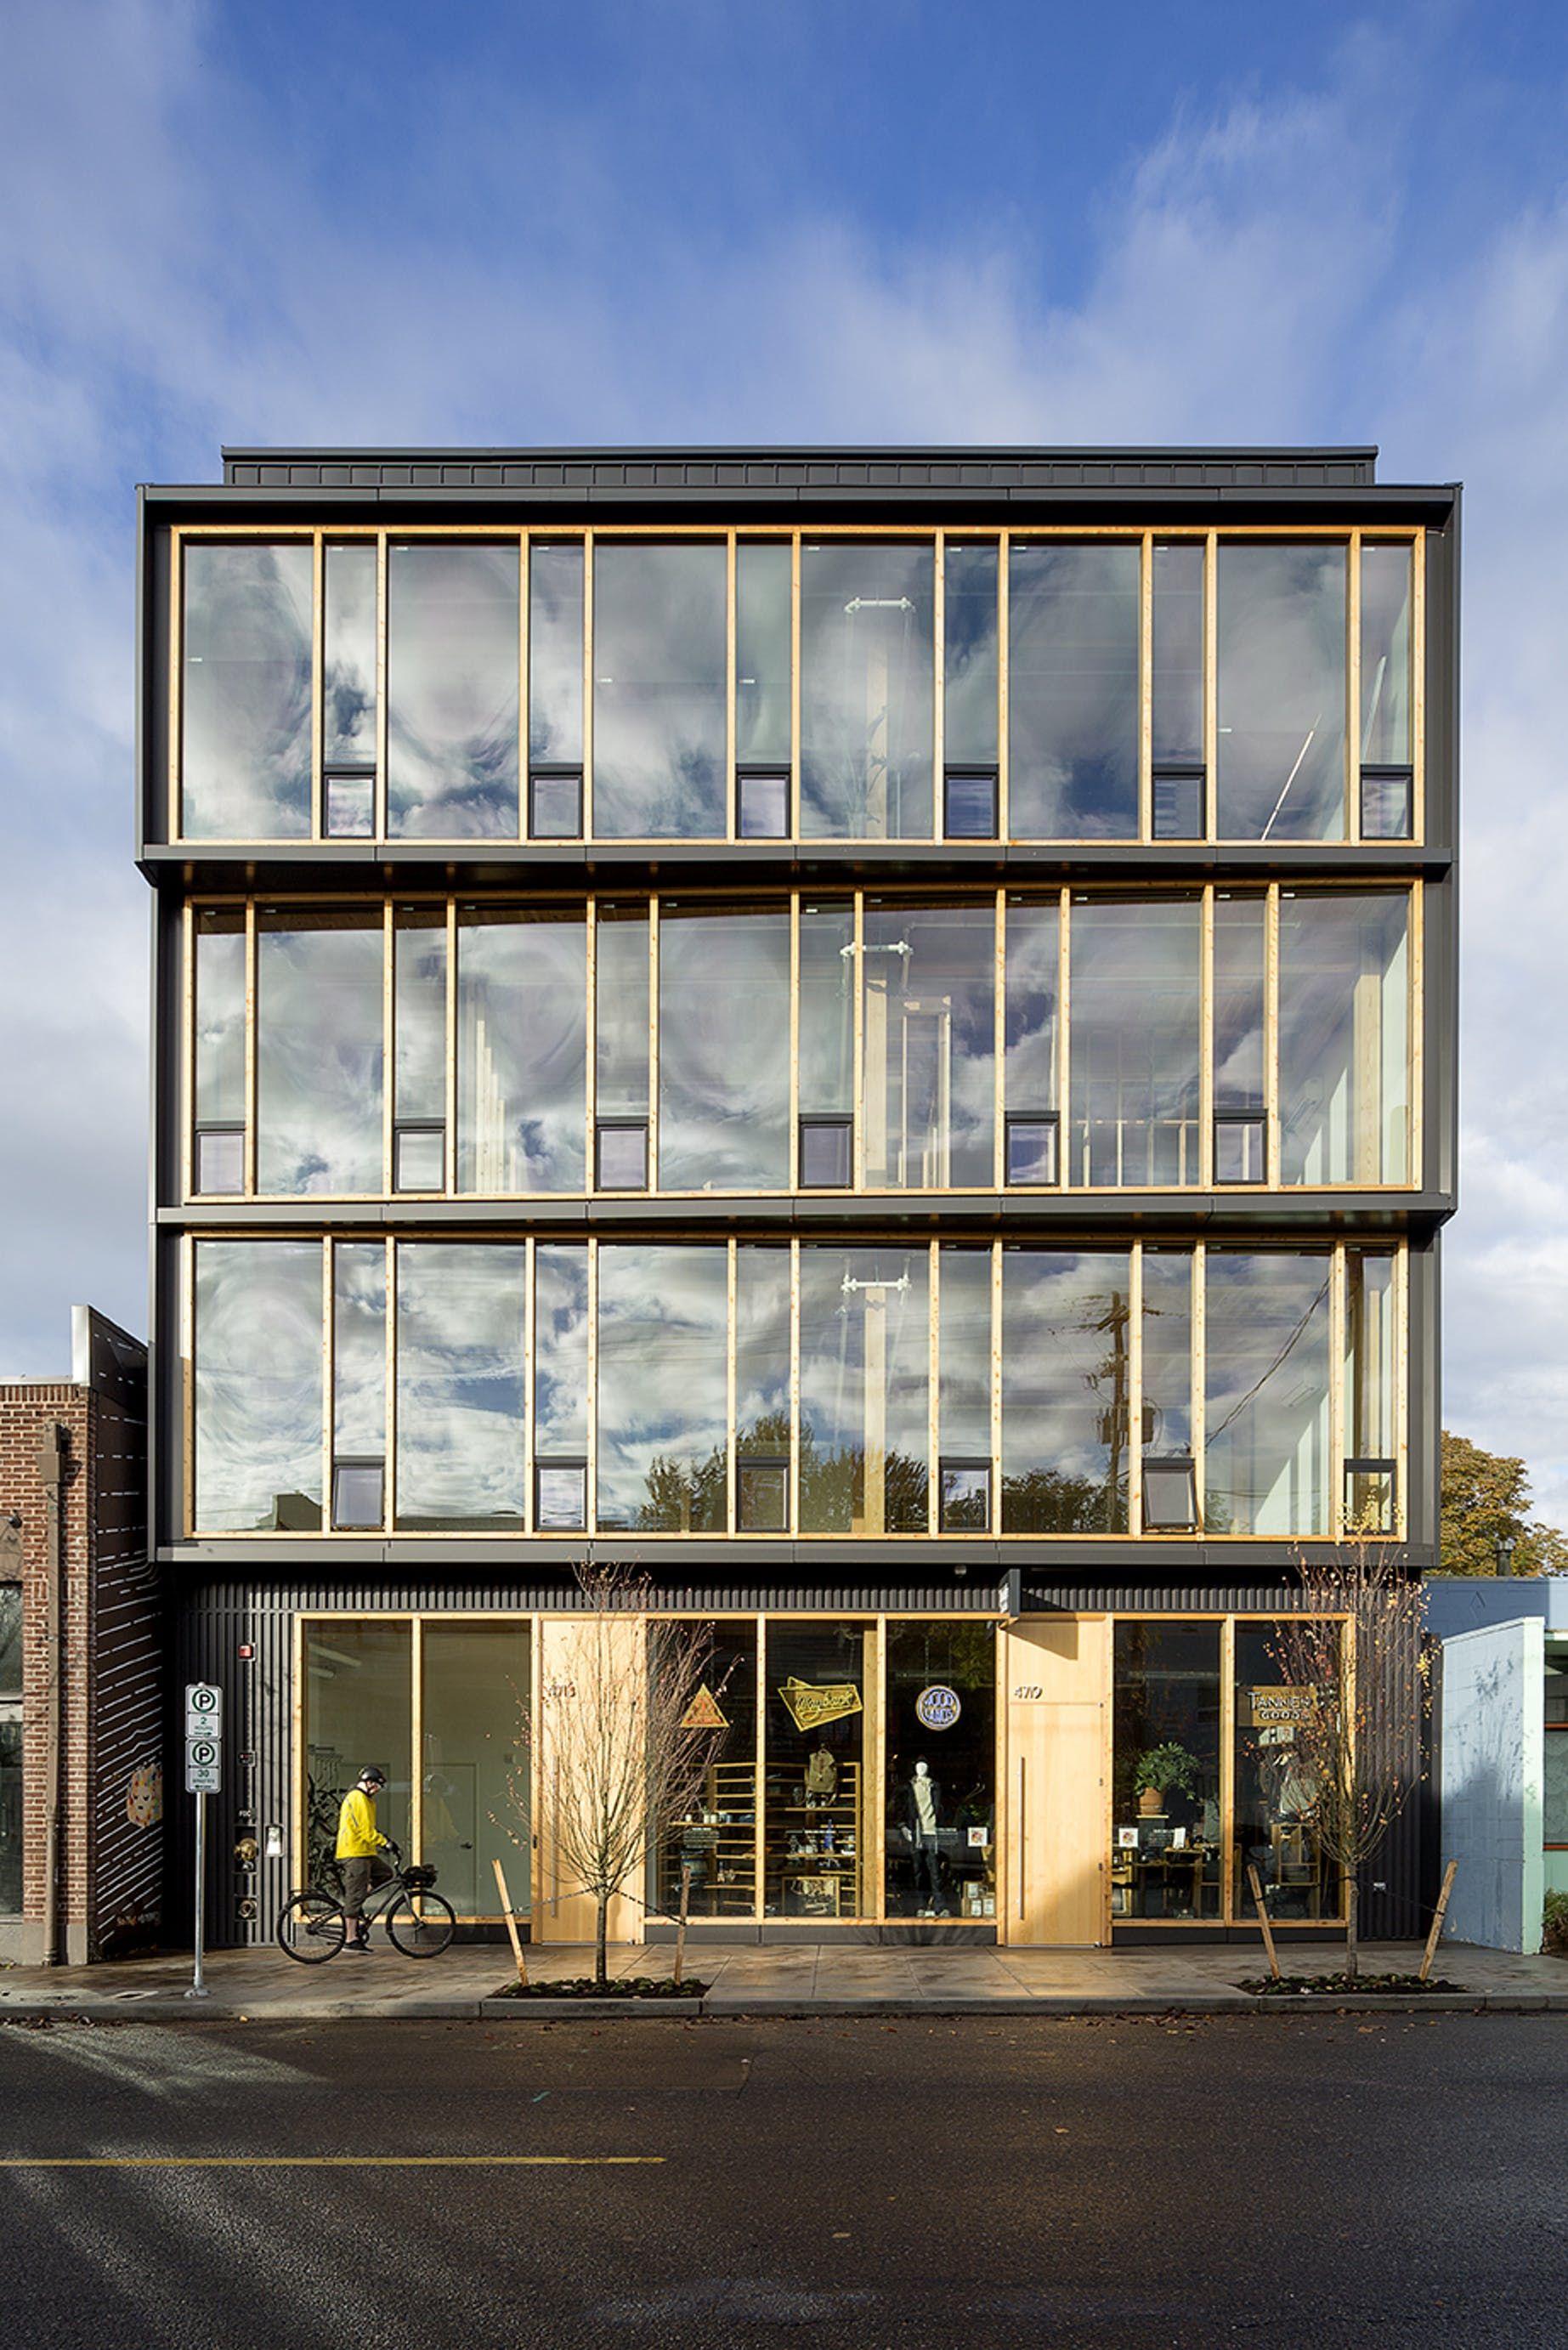 Albina Yard Lever Architecture Archinect Office Building Architecture Architecture Facade Architecture